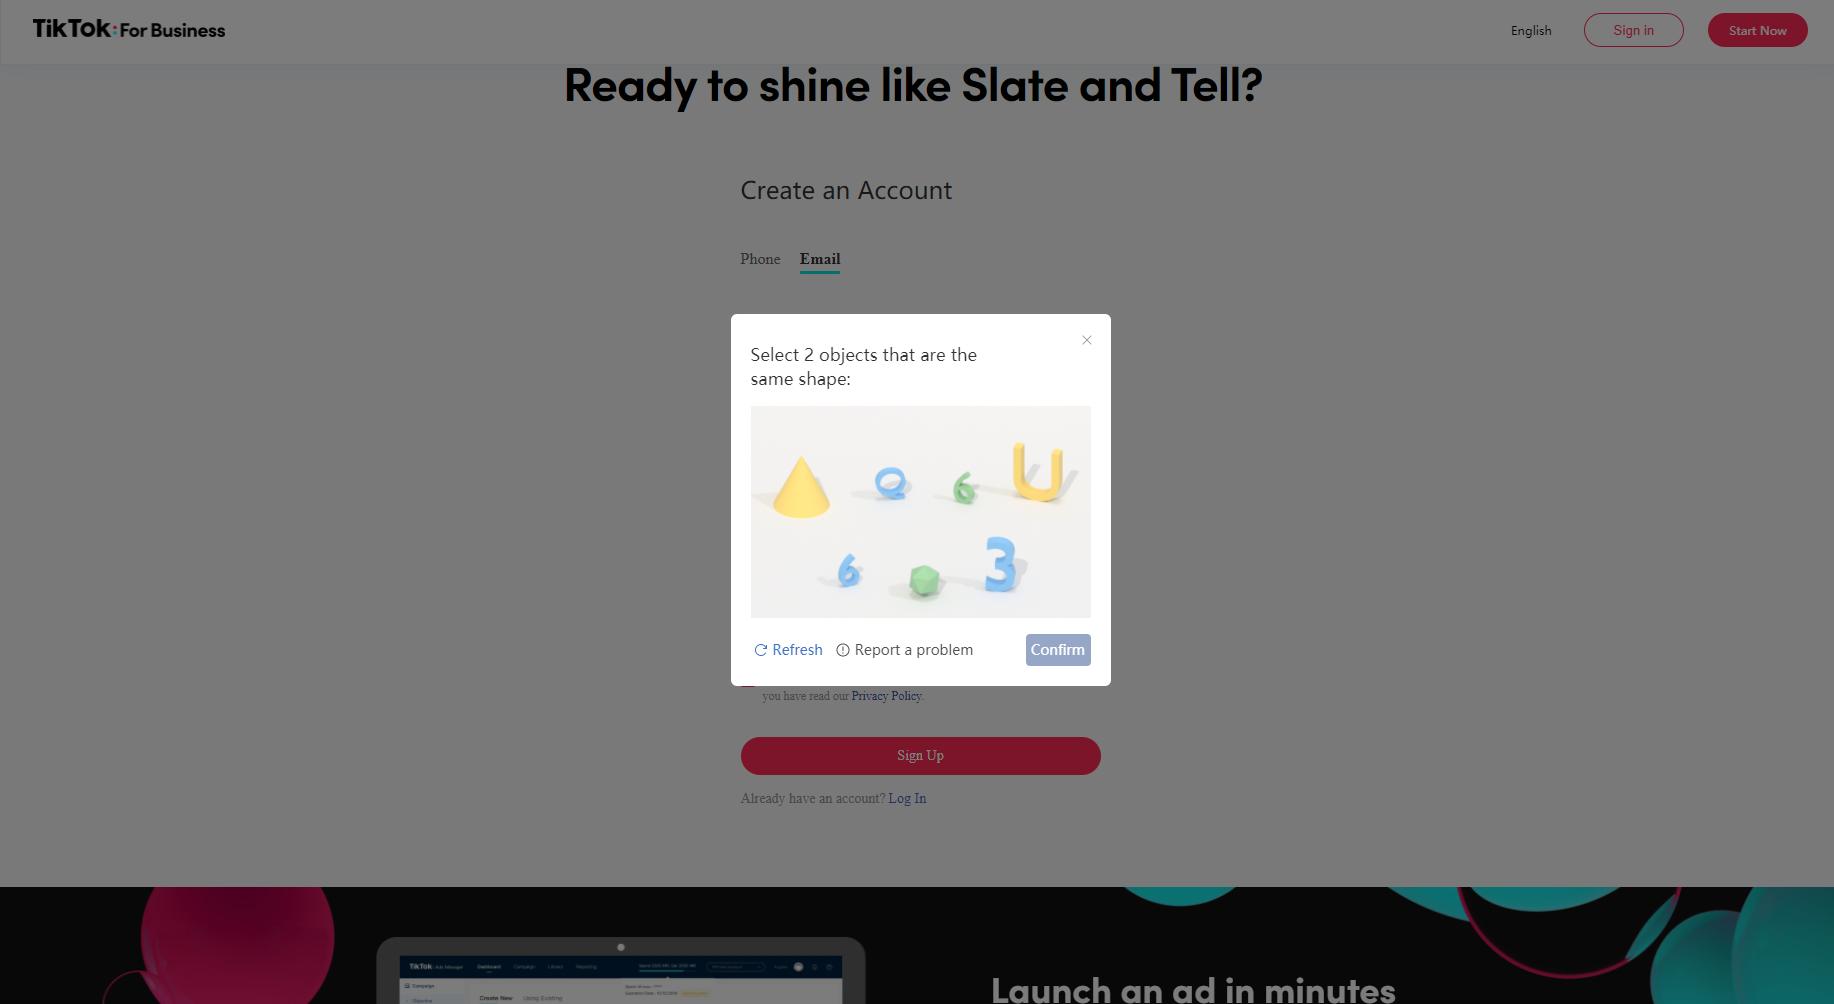 TikTok For Business Security Test Screenshot